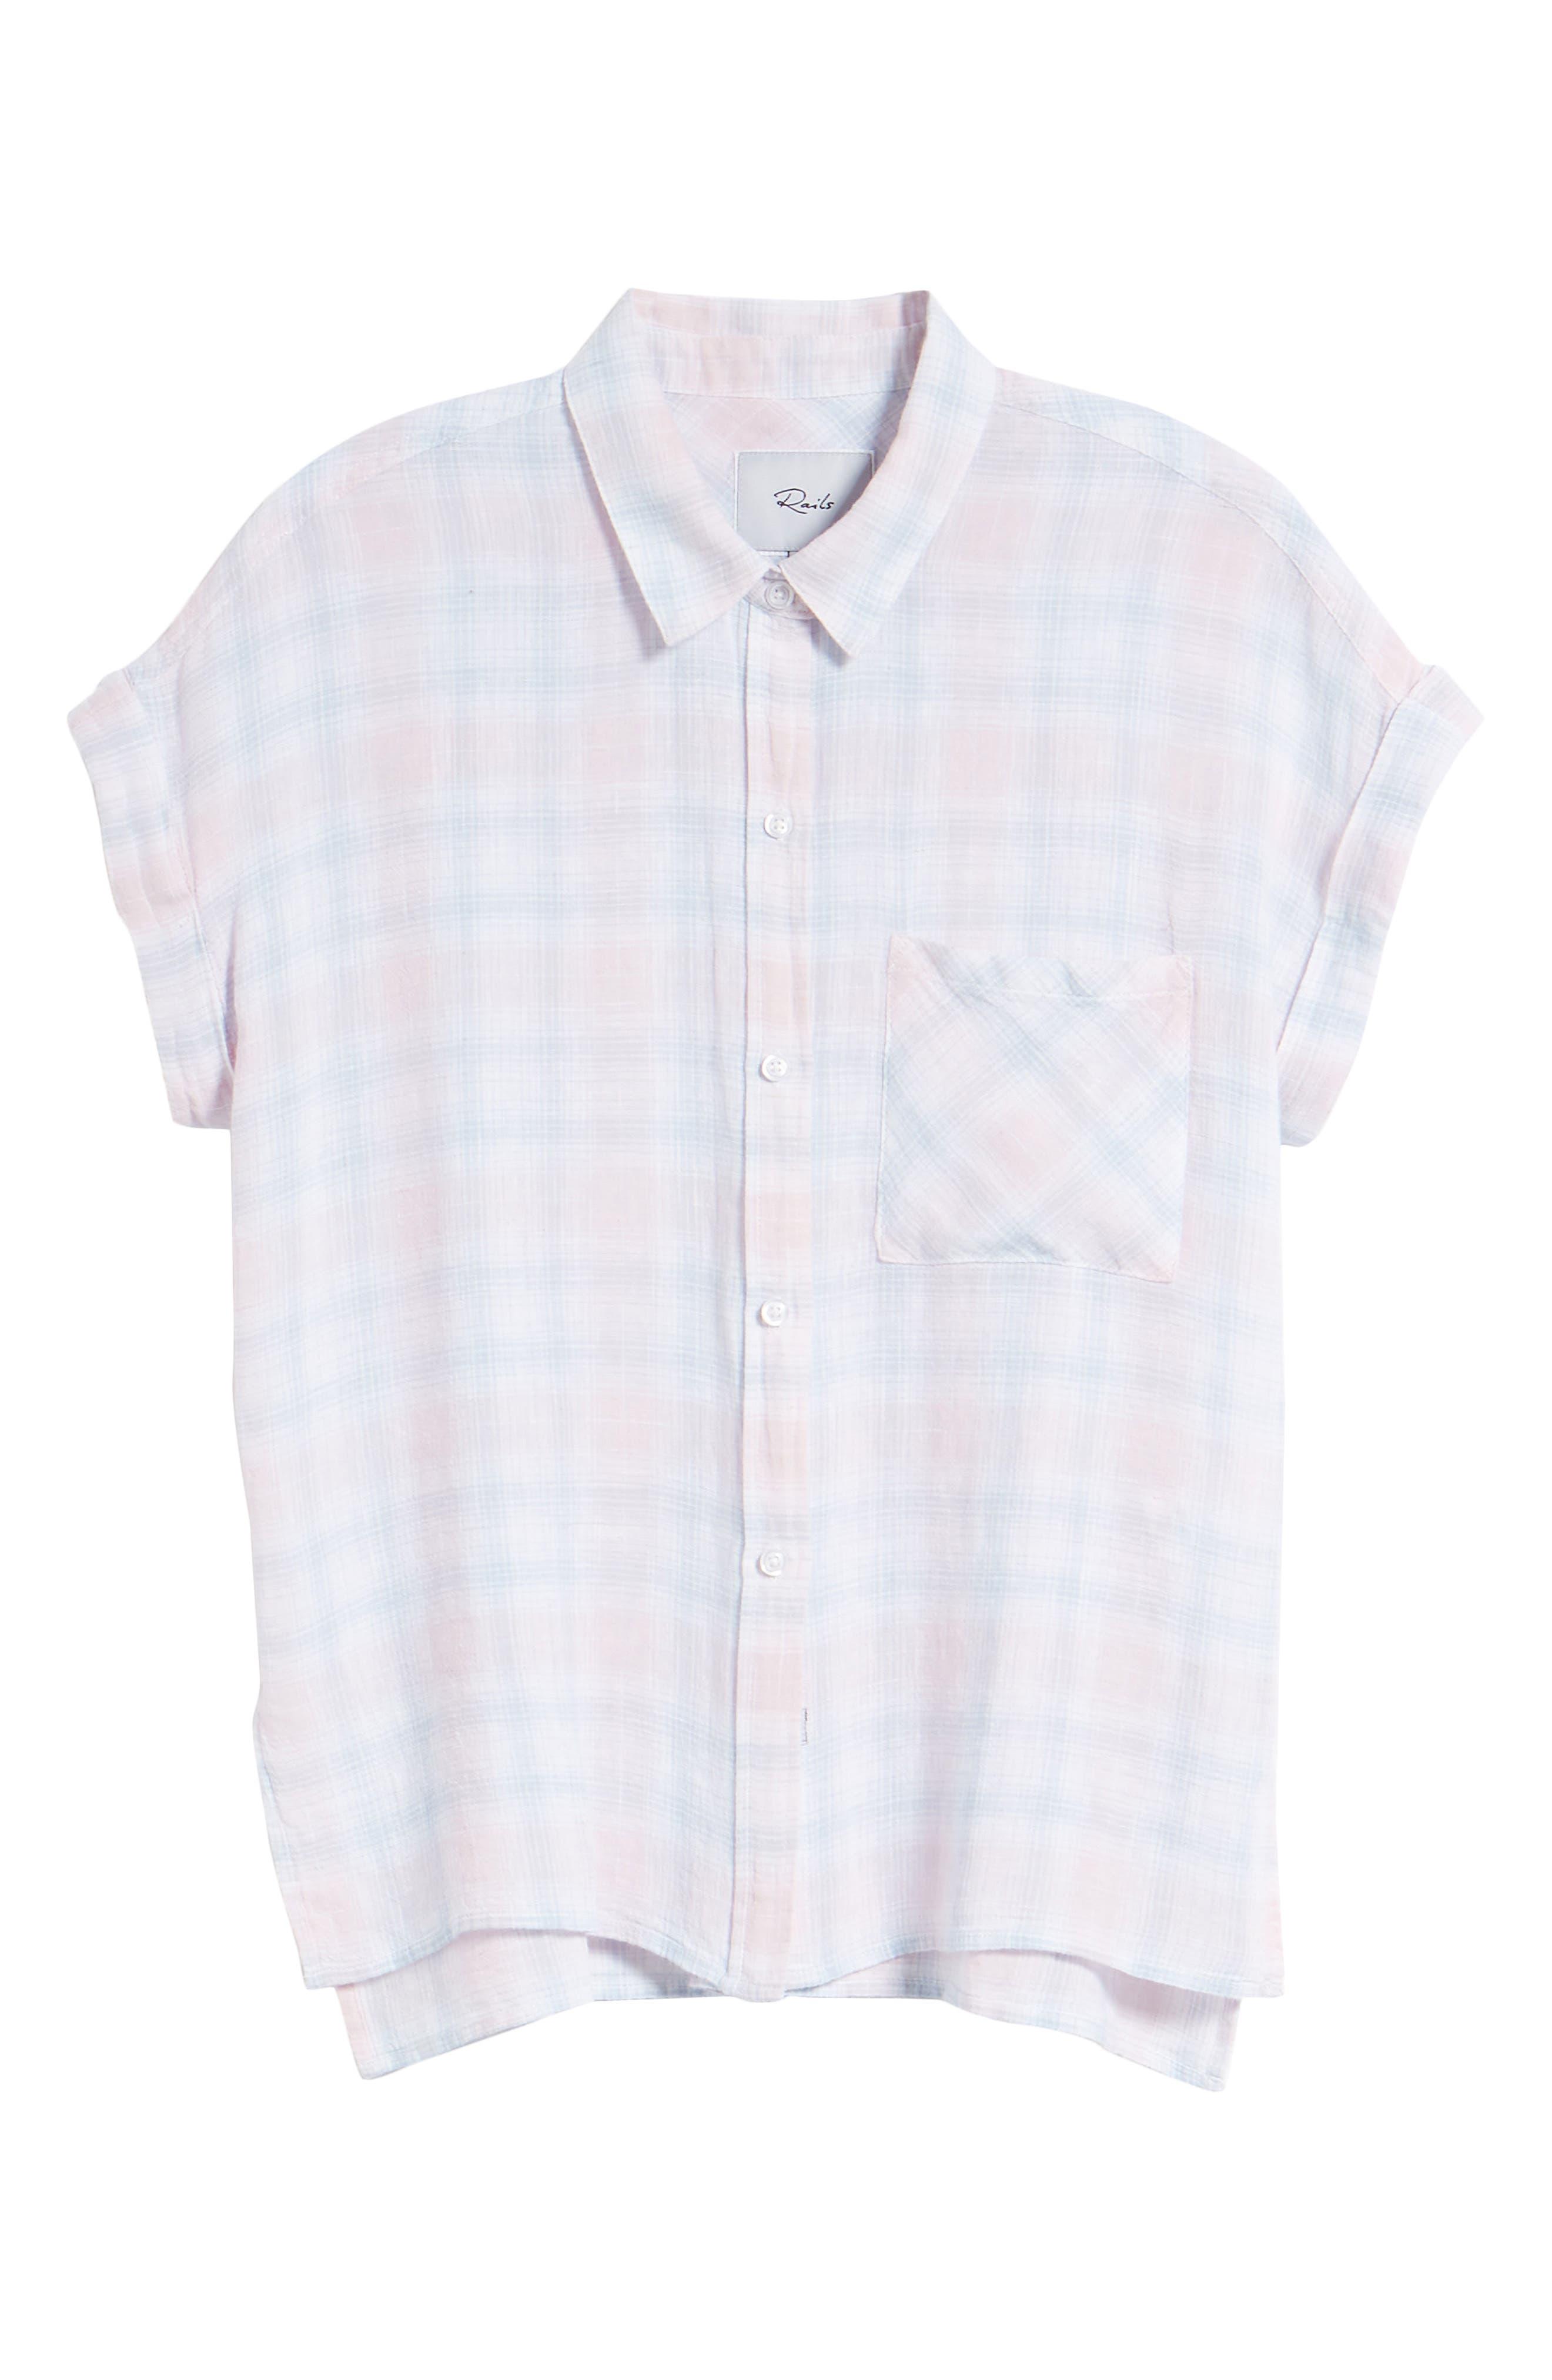 Whitney Shirt,                             Alternate thumbnail 7, color,                             WHITE BLUSH SKY